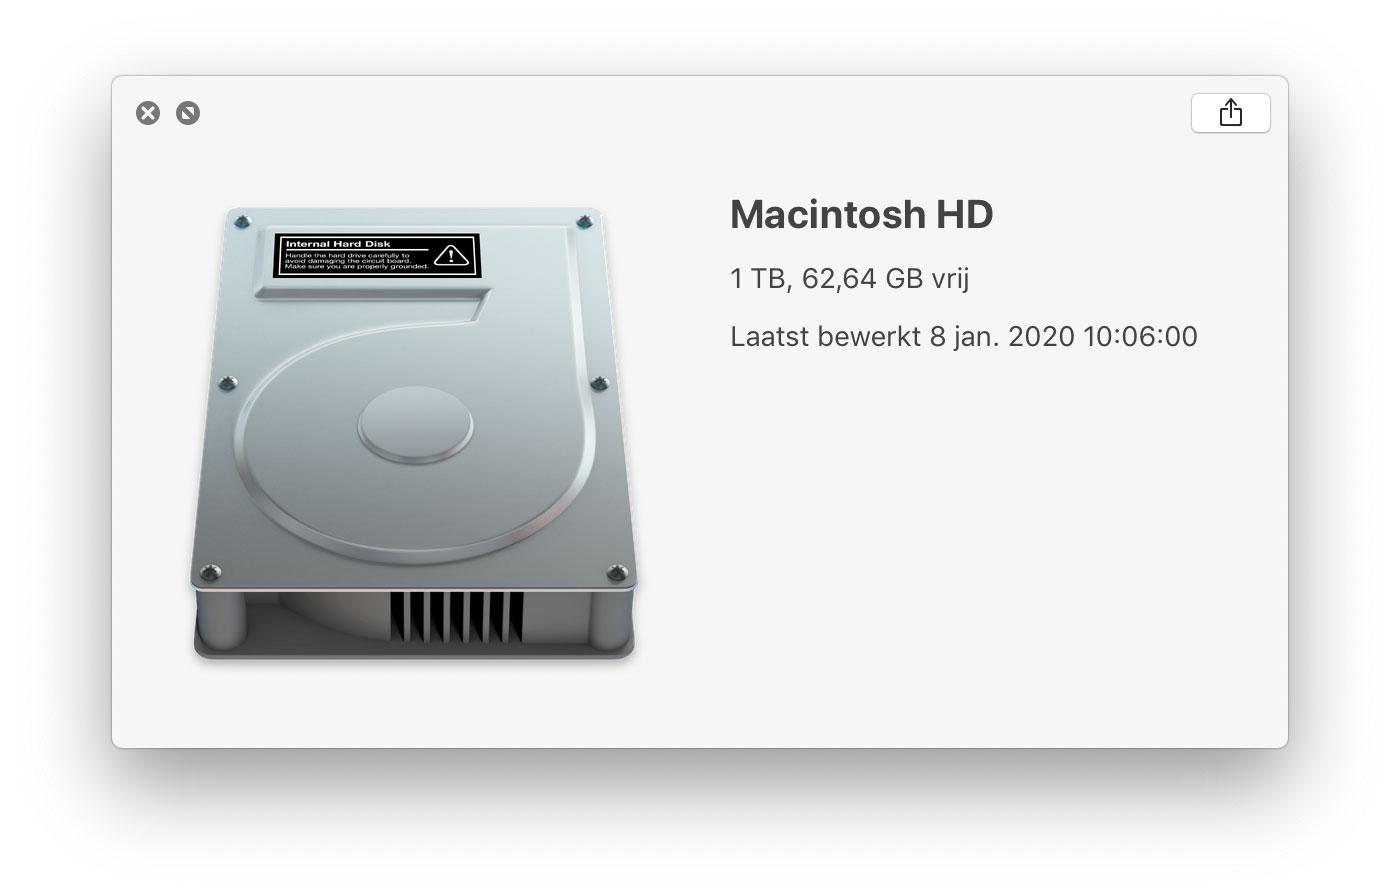 https://www.macfreak.nl/modules/news/images/zArt.MacintoshHD.jpg